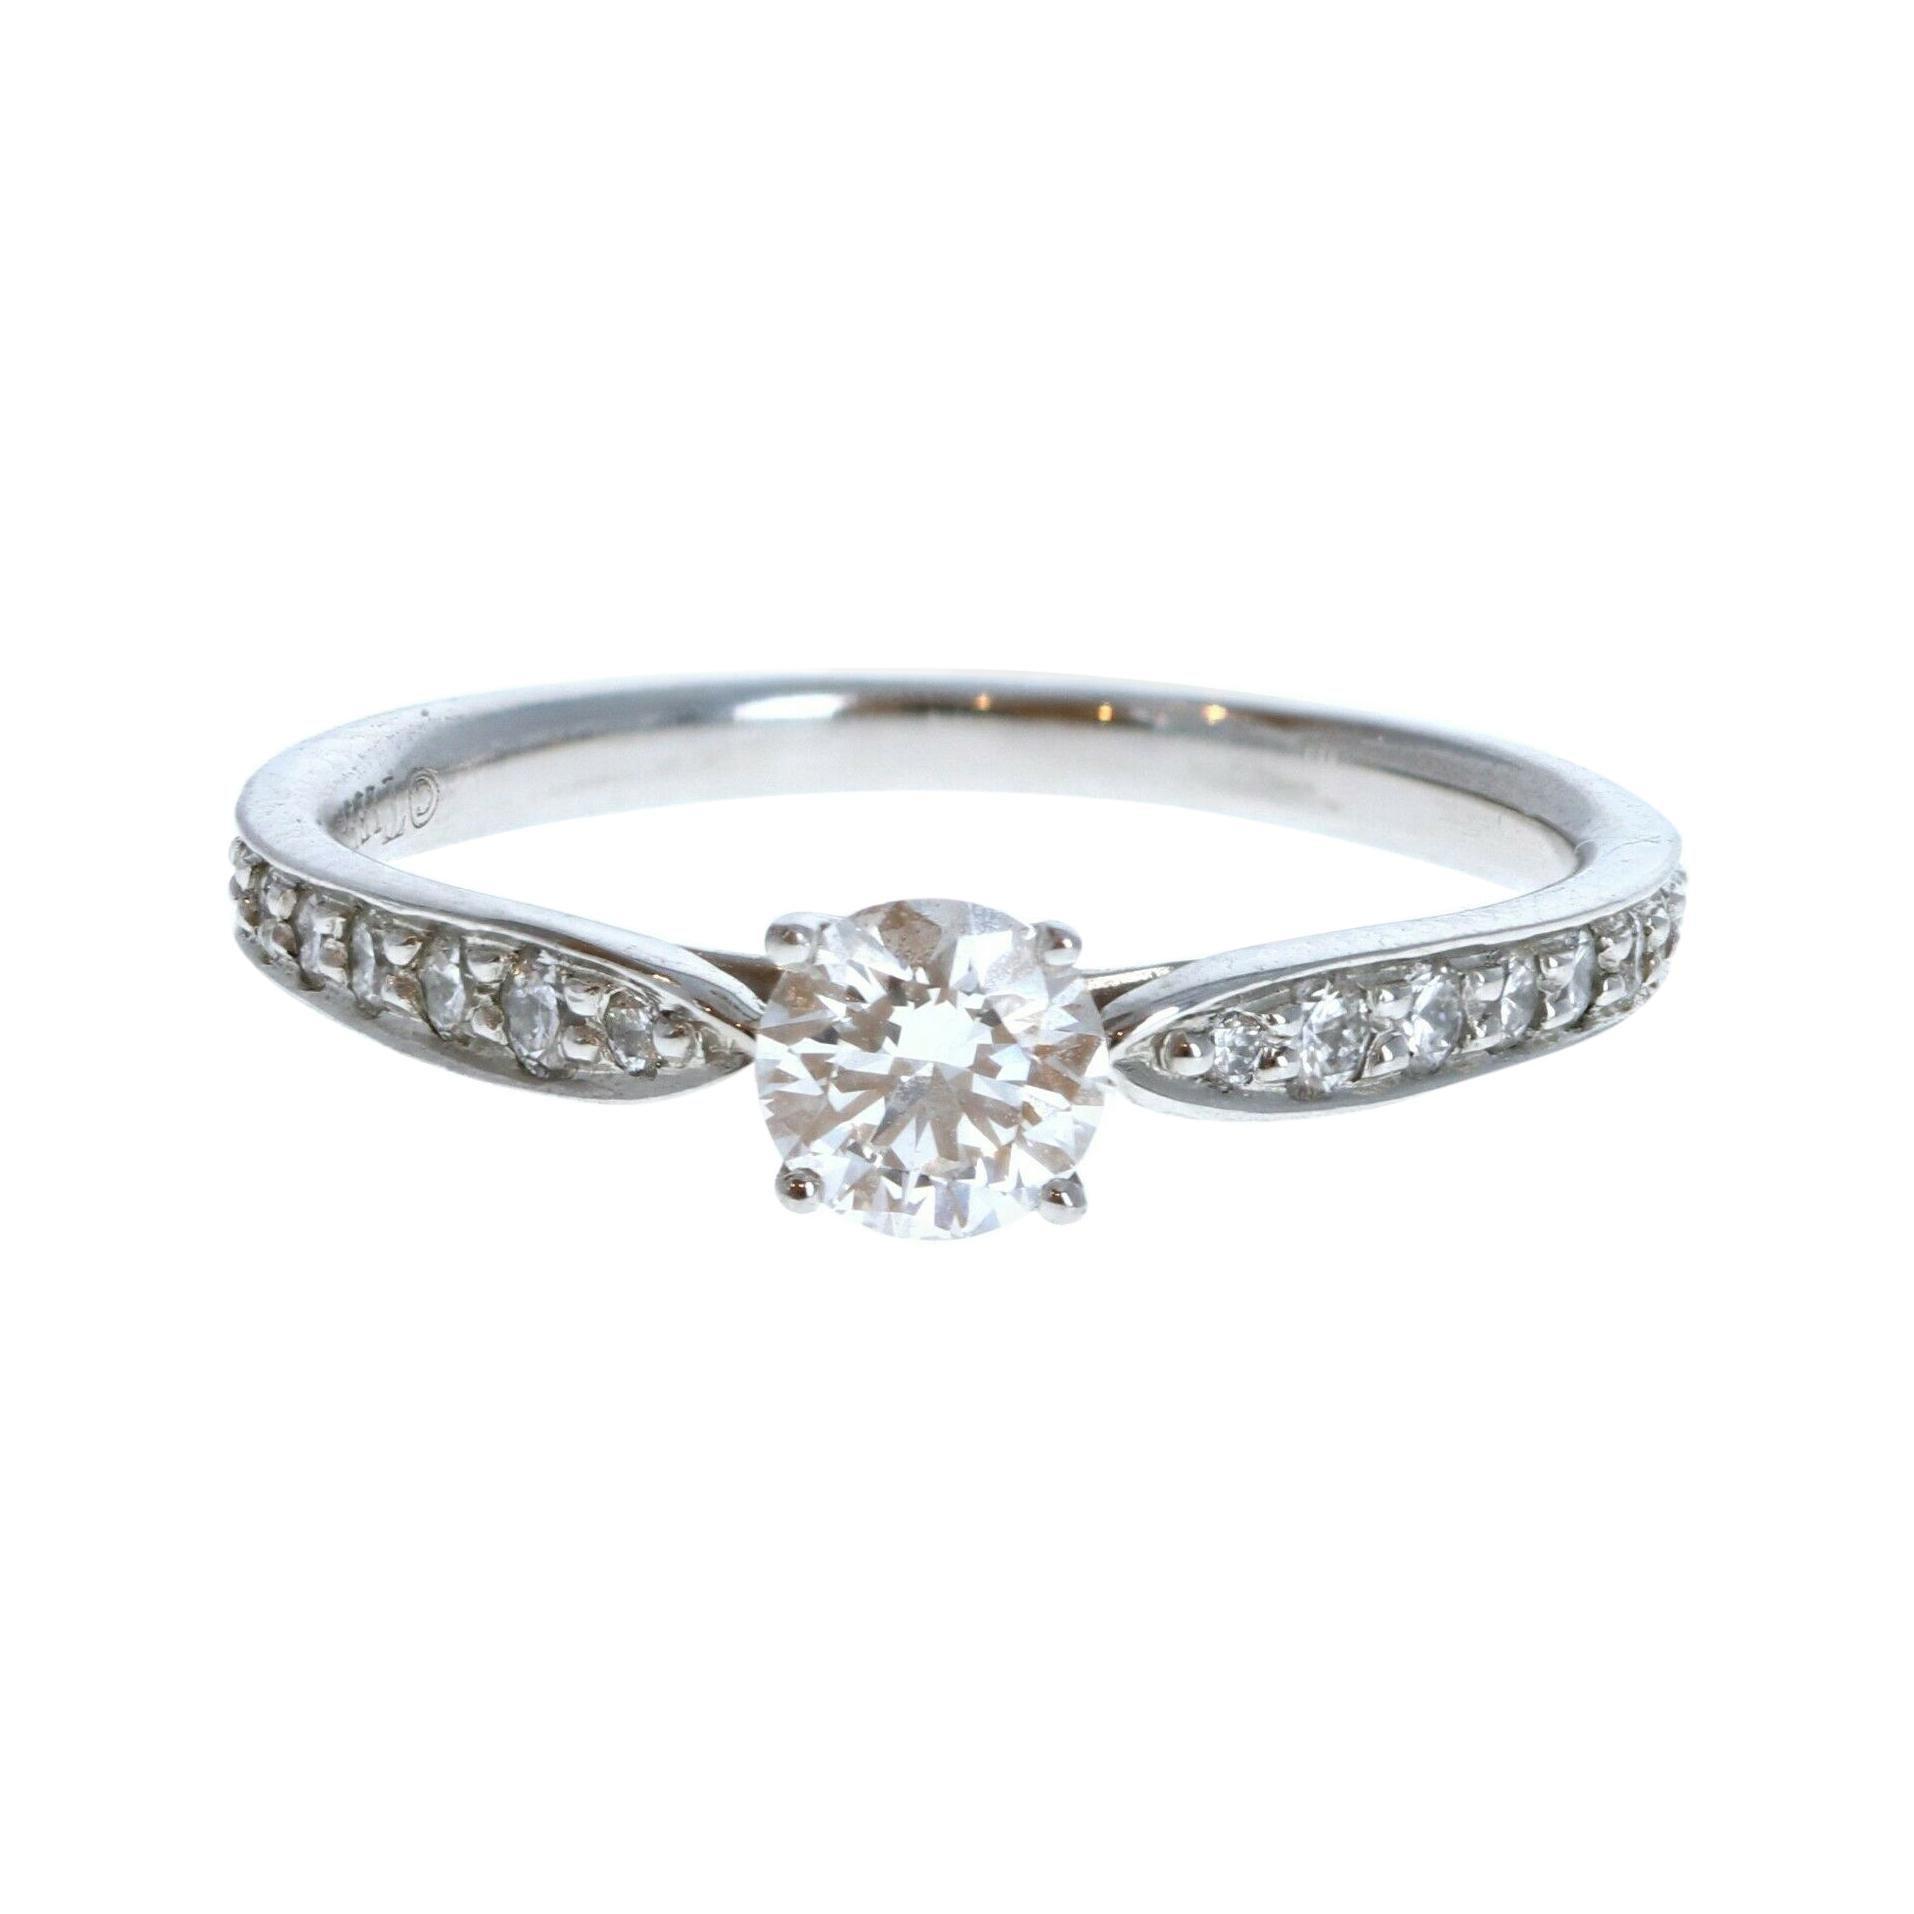 Tiffany & Co. Harmony Platinum & Diamond Engagement Ring 0.32ctw H VVS1